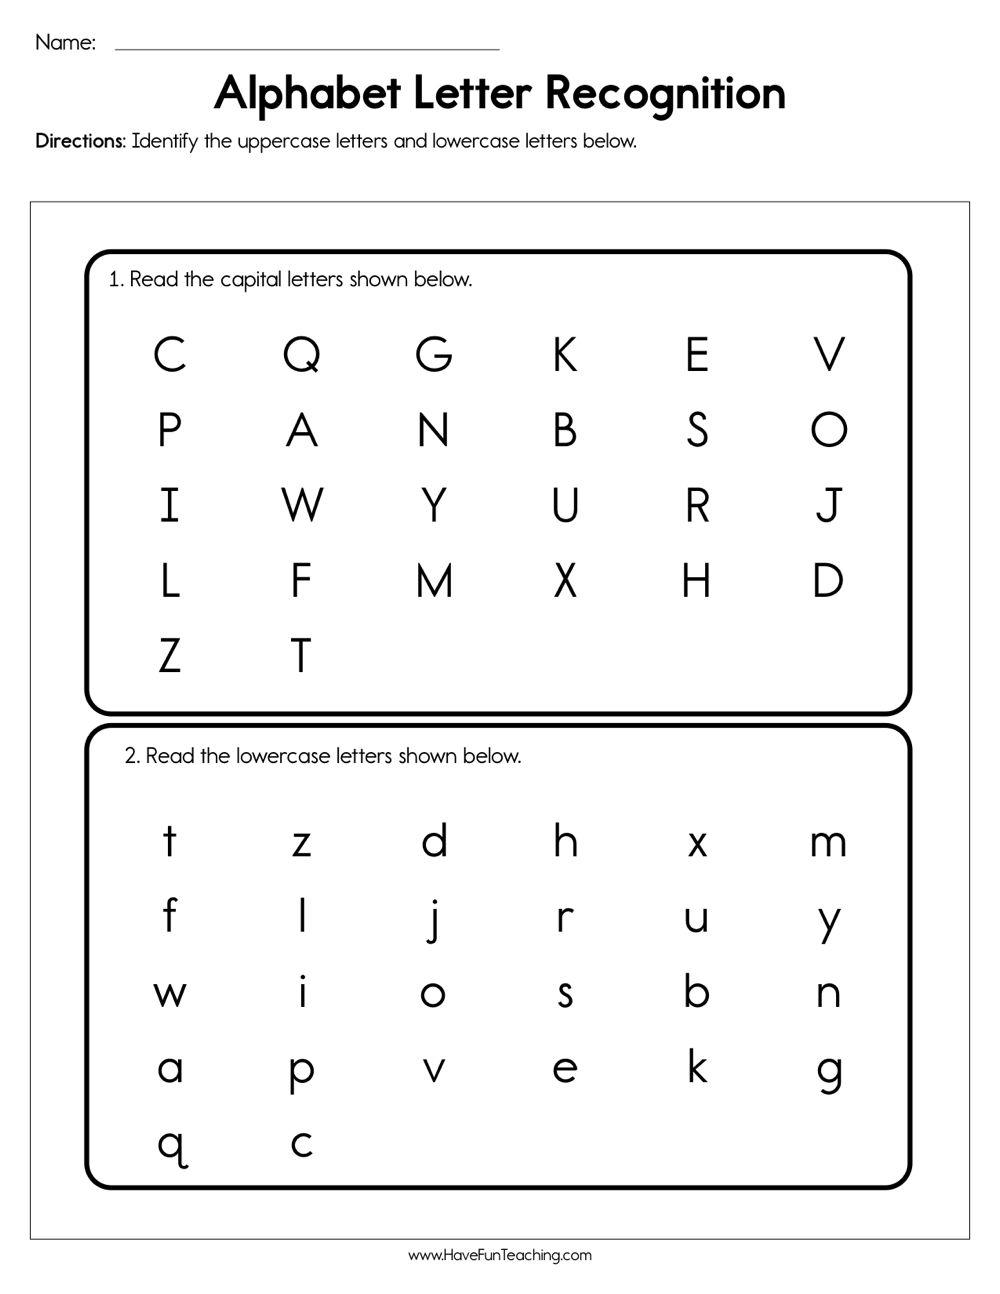 Alphabet Letter Recognition Assessment Letter Recognition Worksheets Alphabet Letter Recognition Letter Recognition Kindergarten